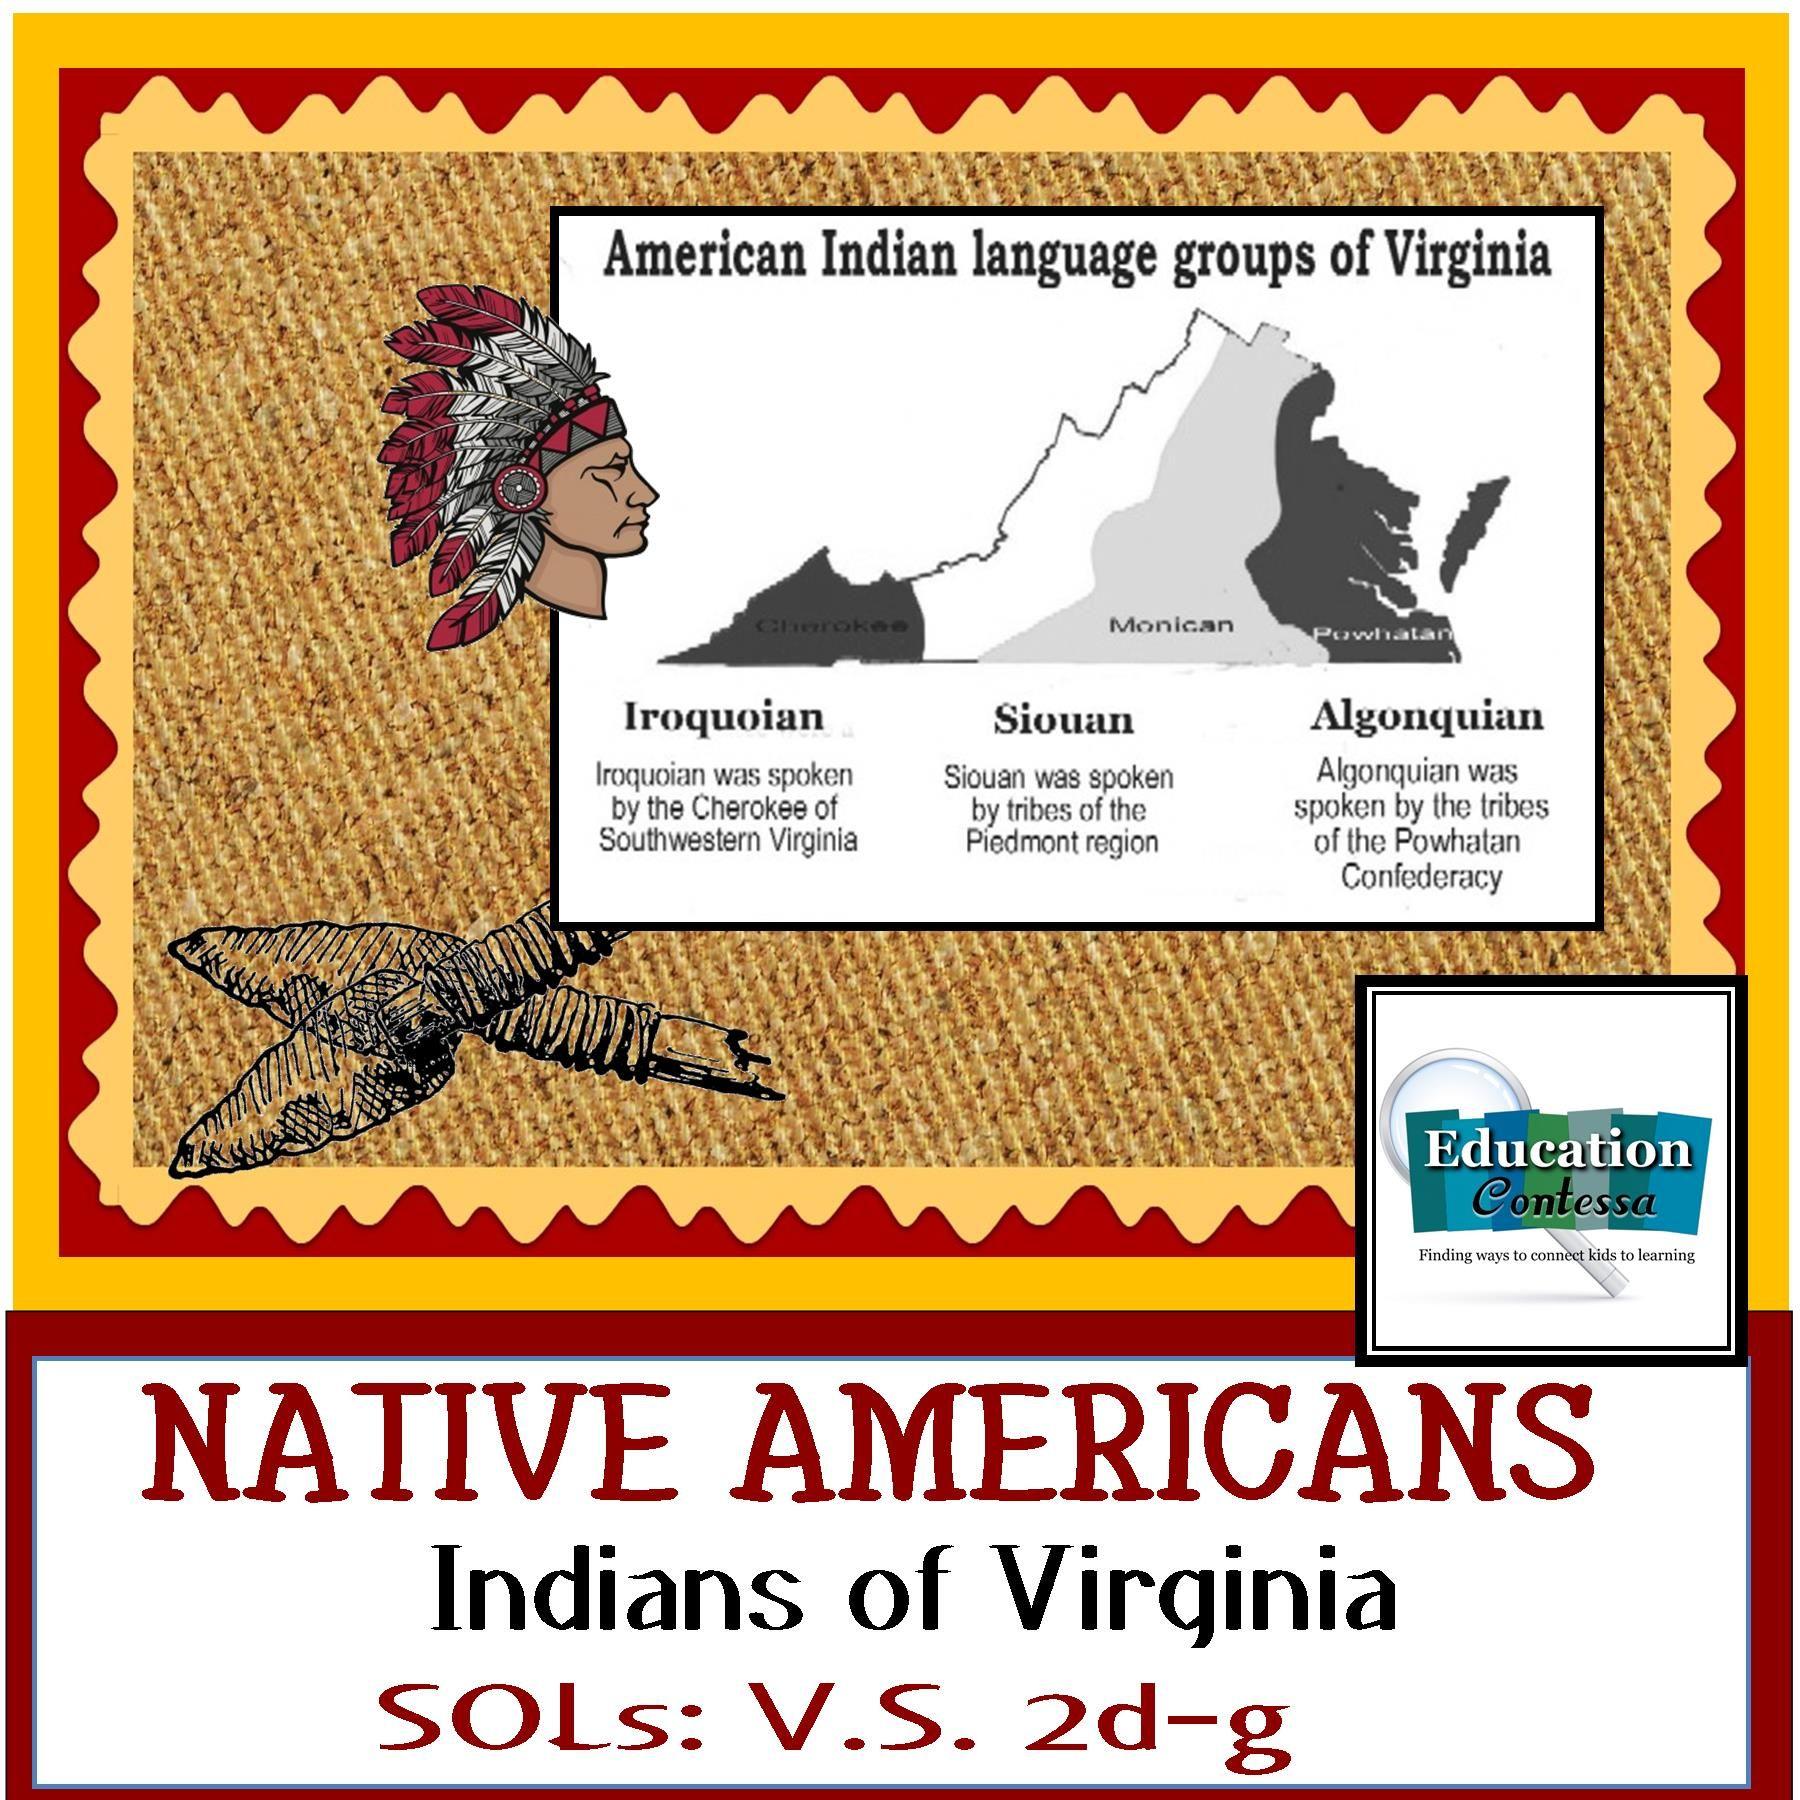 NATIVE AMERICAN INDIANS OF VIRGINIA - SOLs for Virginia